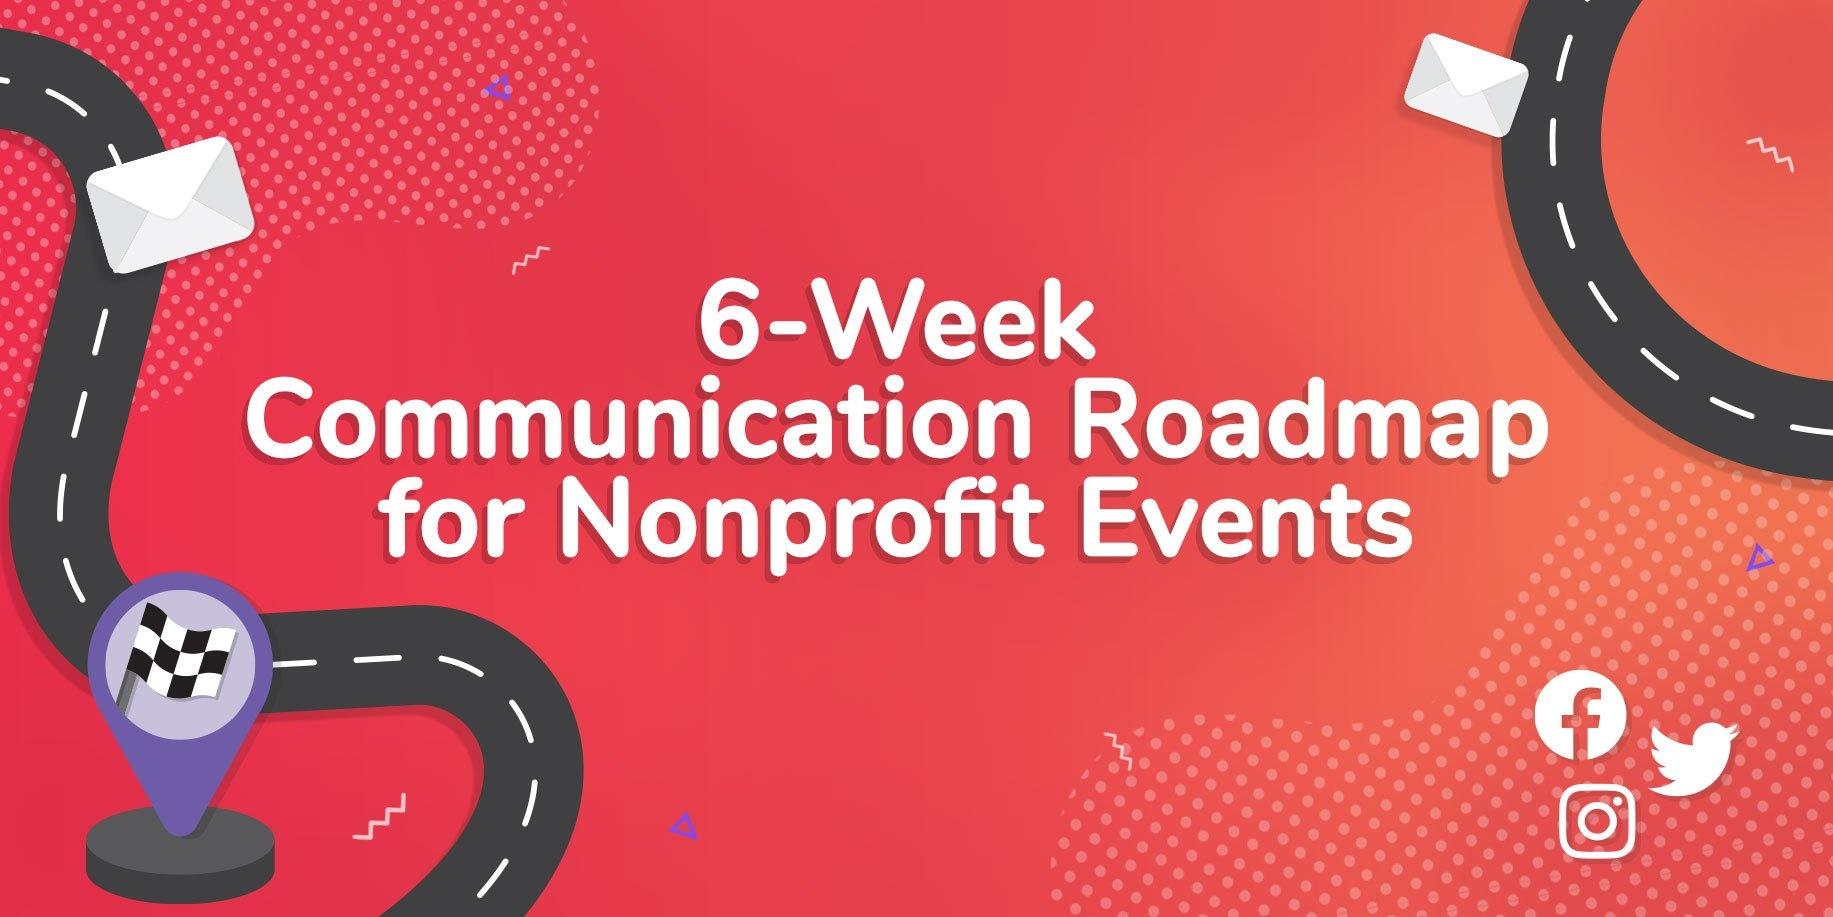 6 Week Communication Roadmap for Nonprofit Events Image